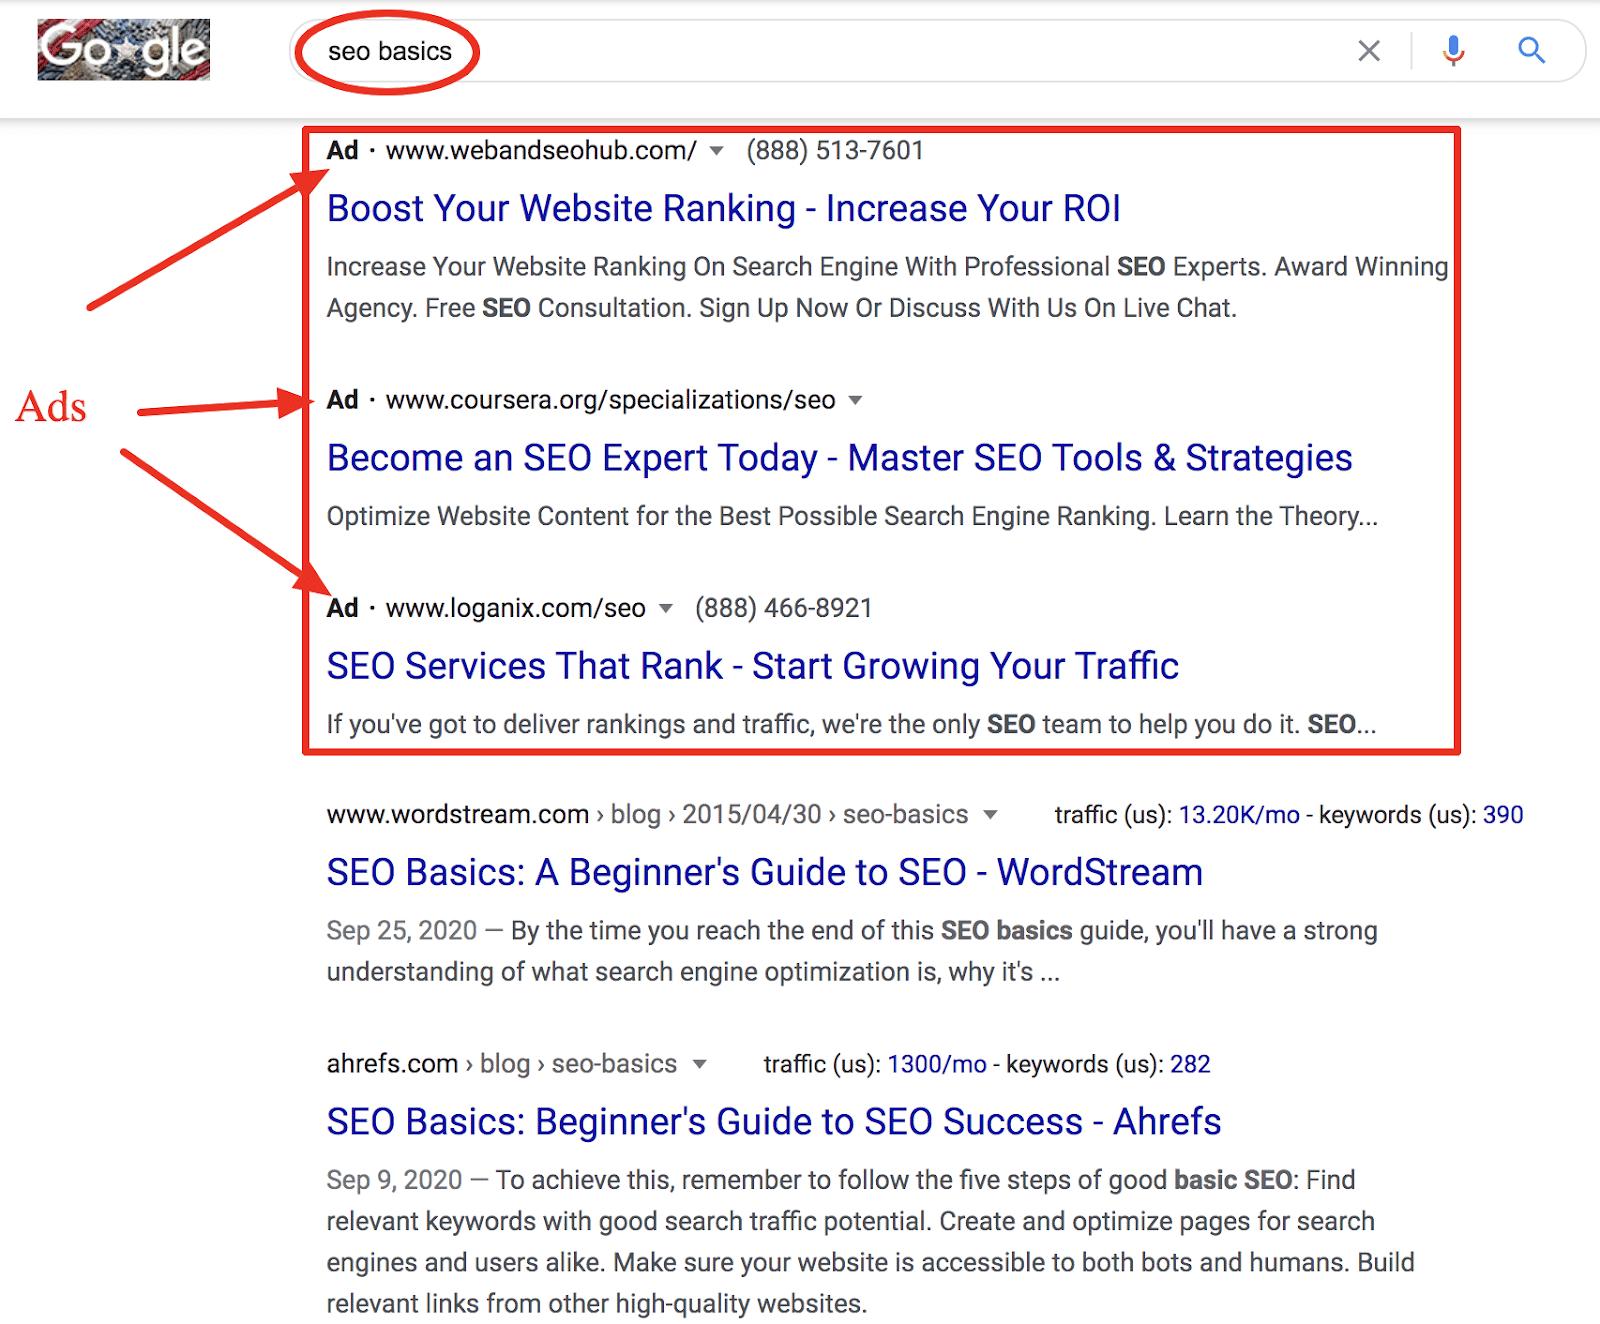 google ad example affiliate marketing traffic